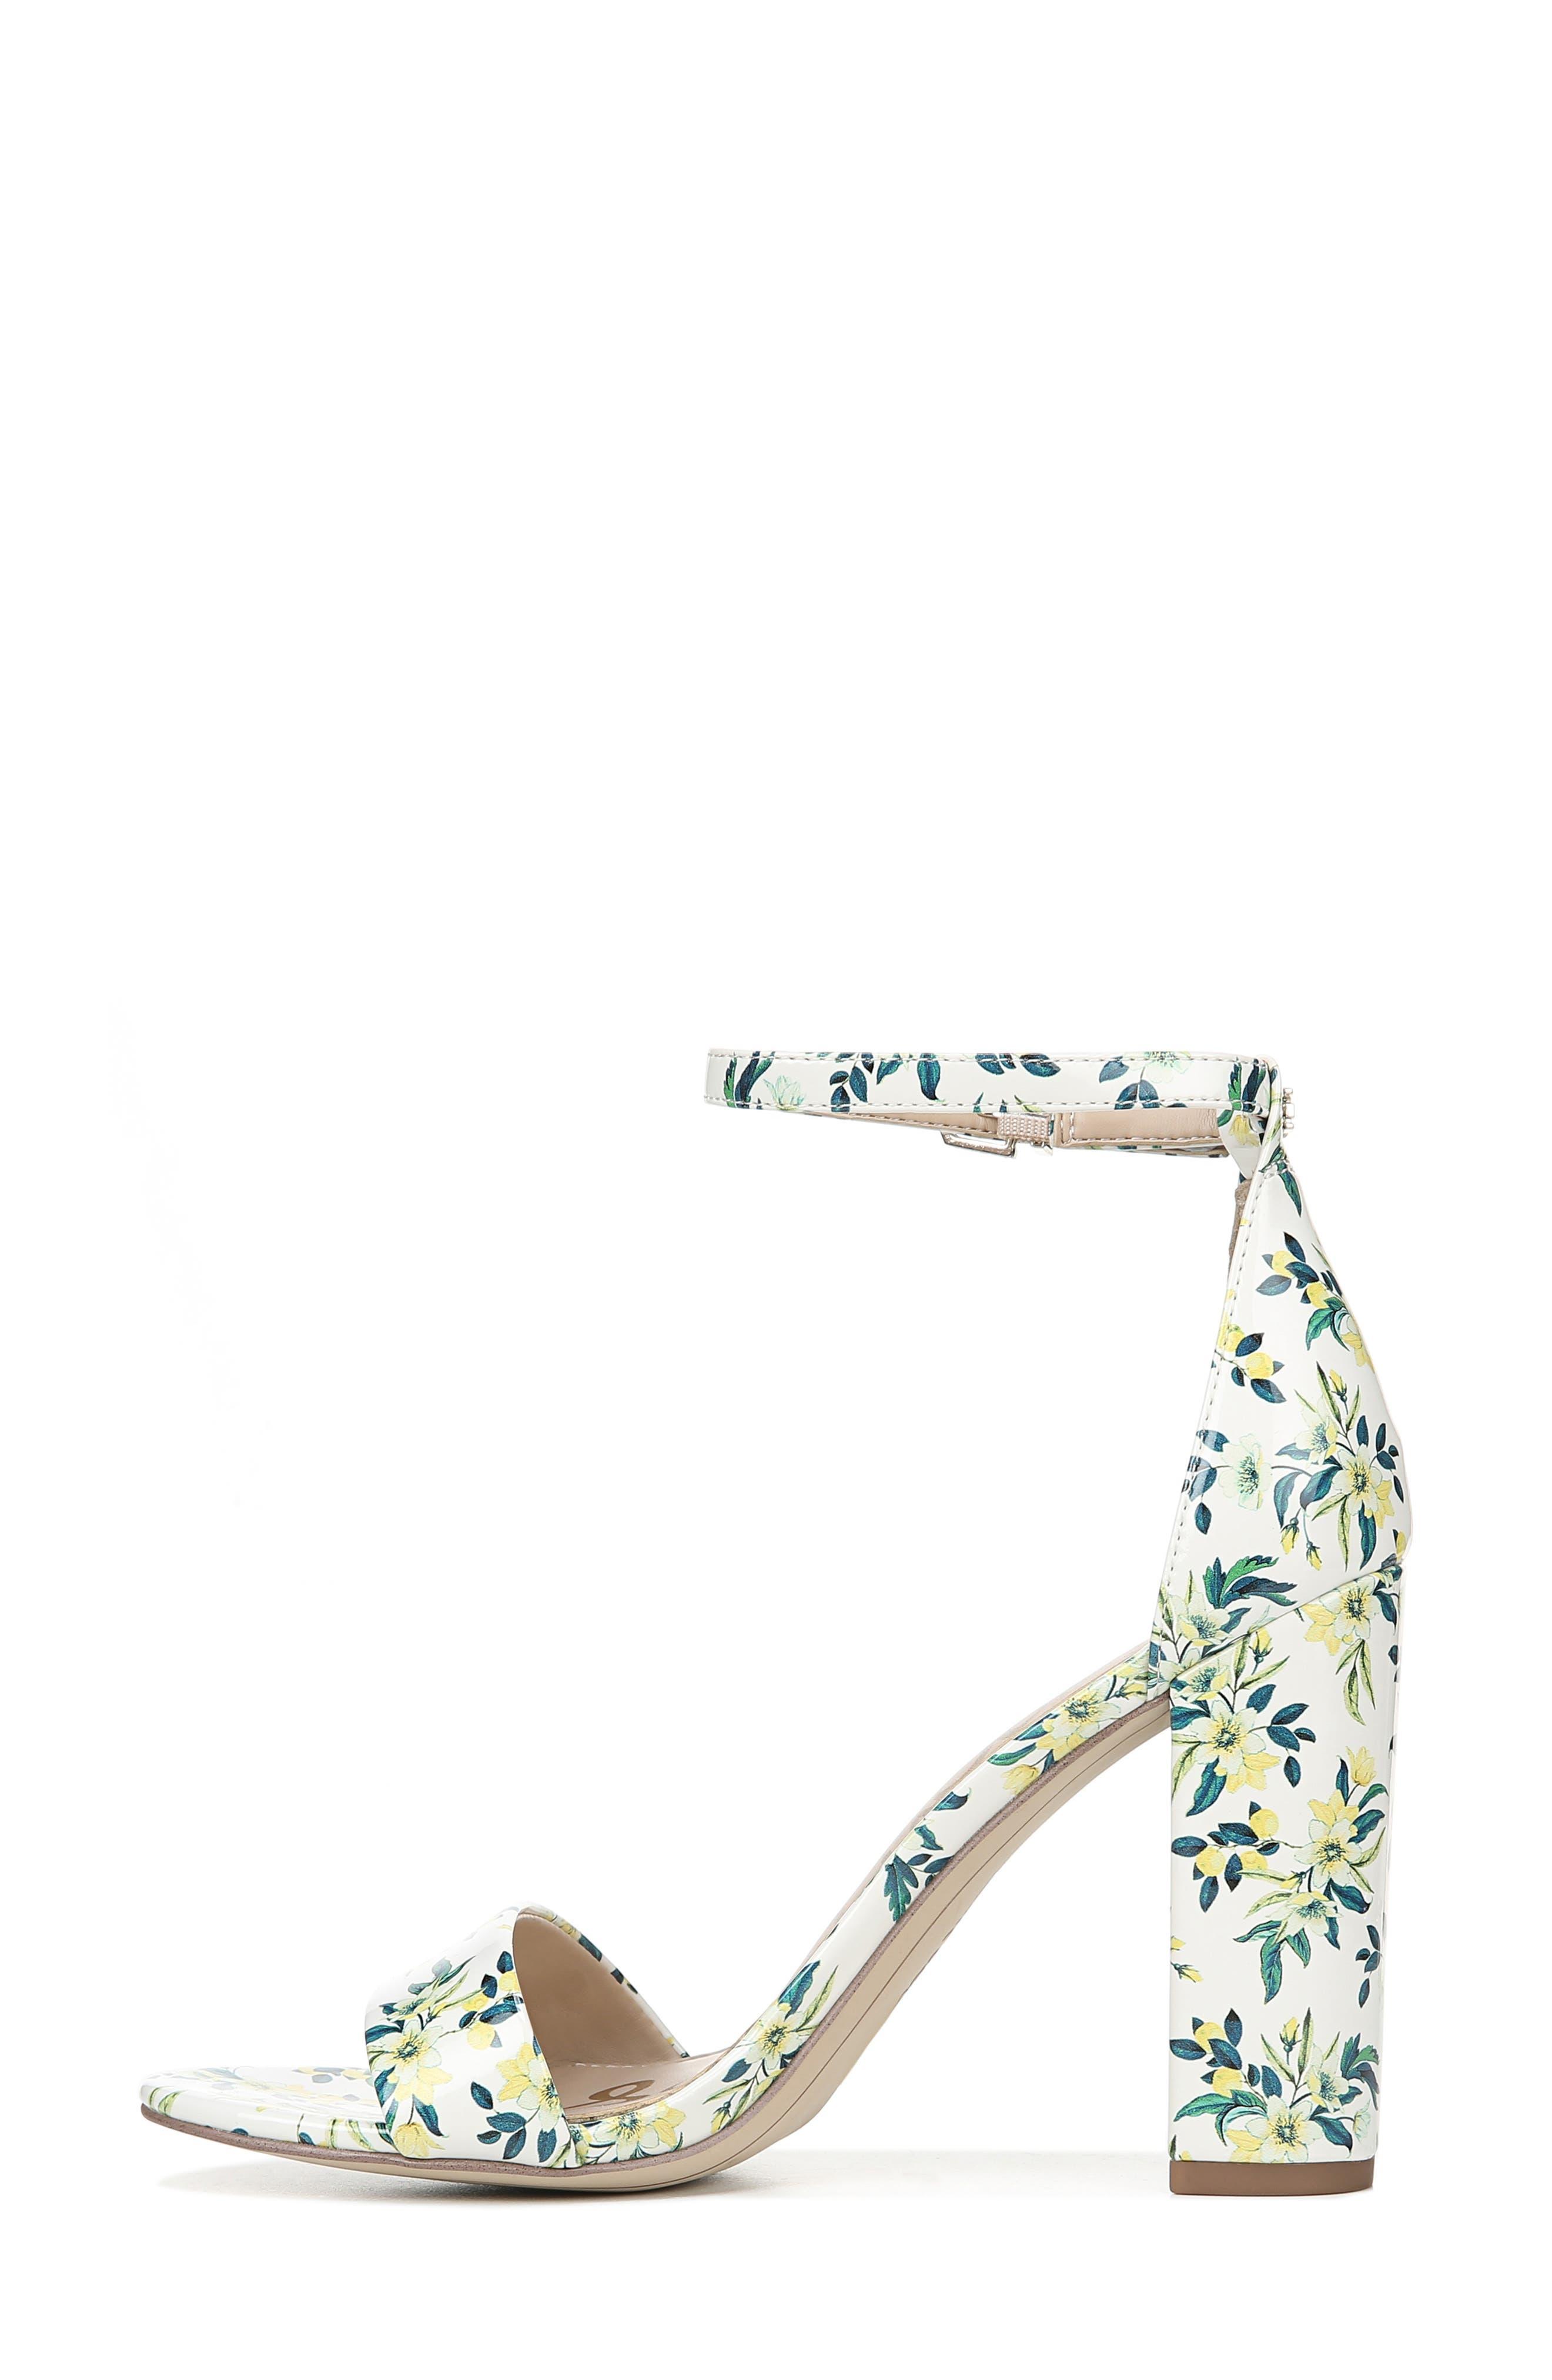 Yaro Ankle Strap Sandal,                             Alternate thumbnail 9, color,                             WHITE MULTI FABRIC